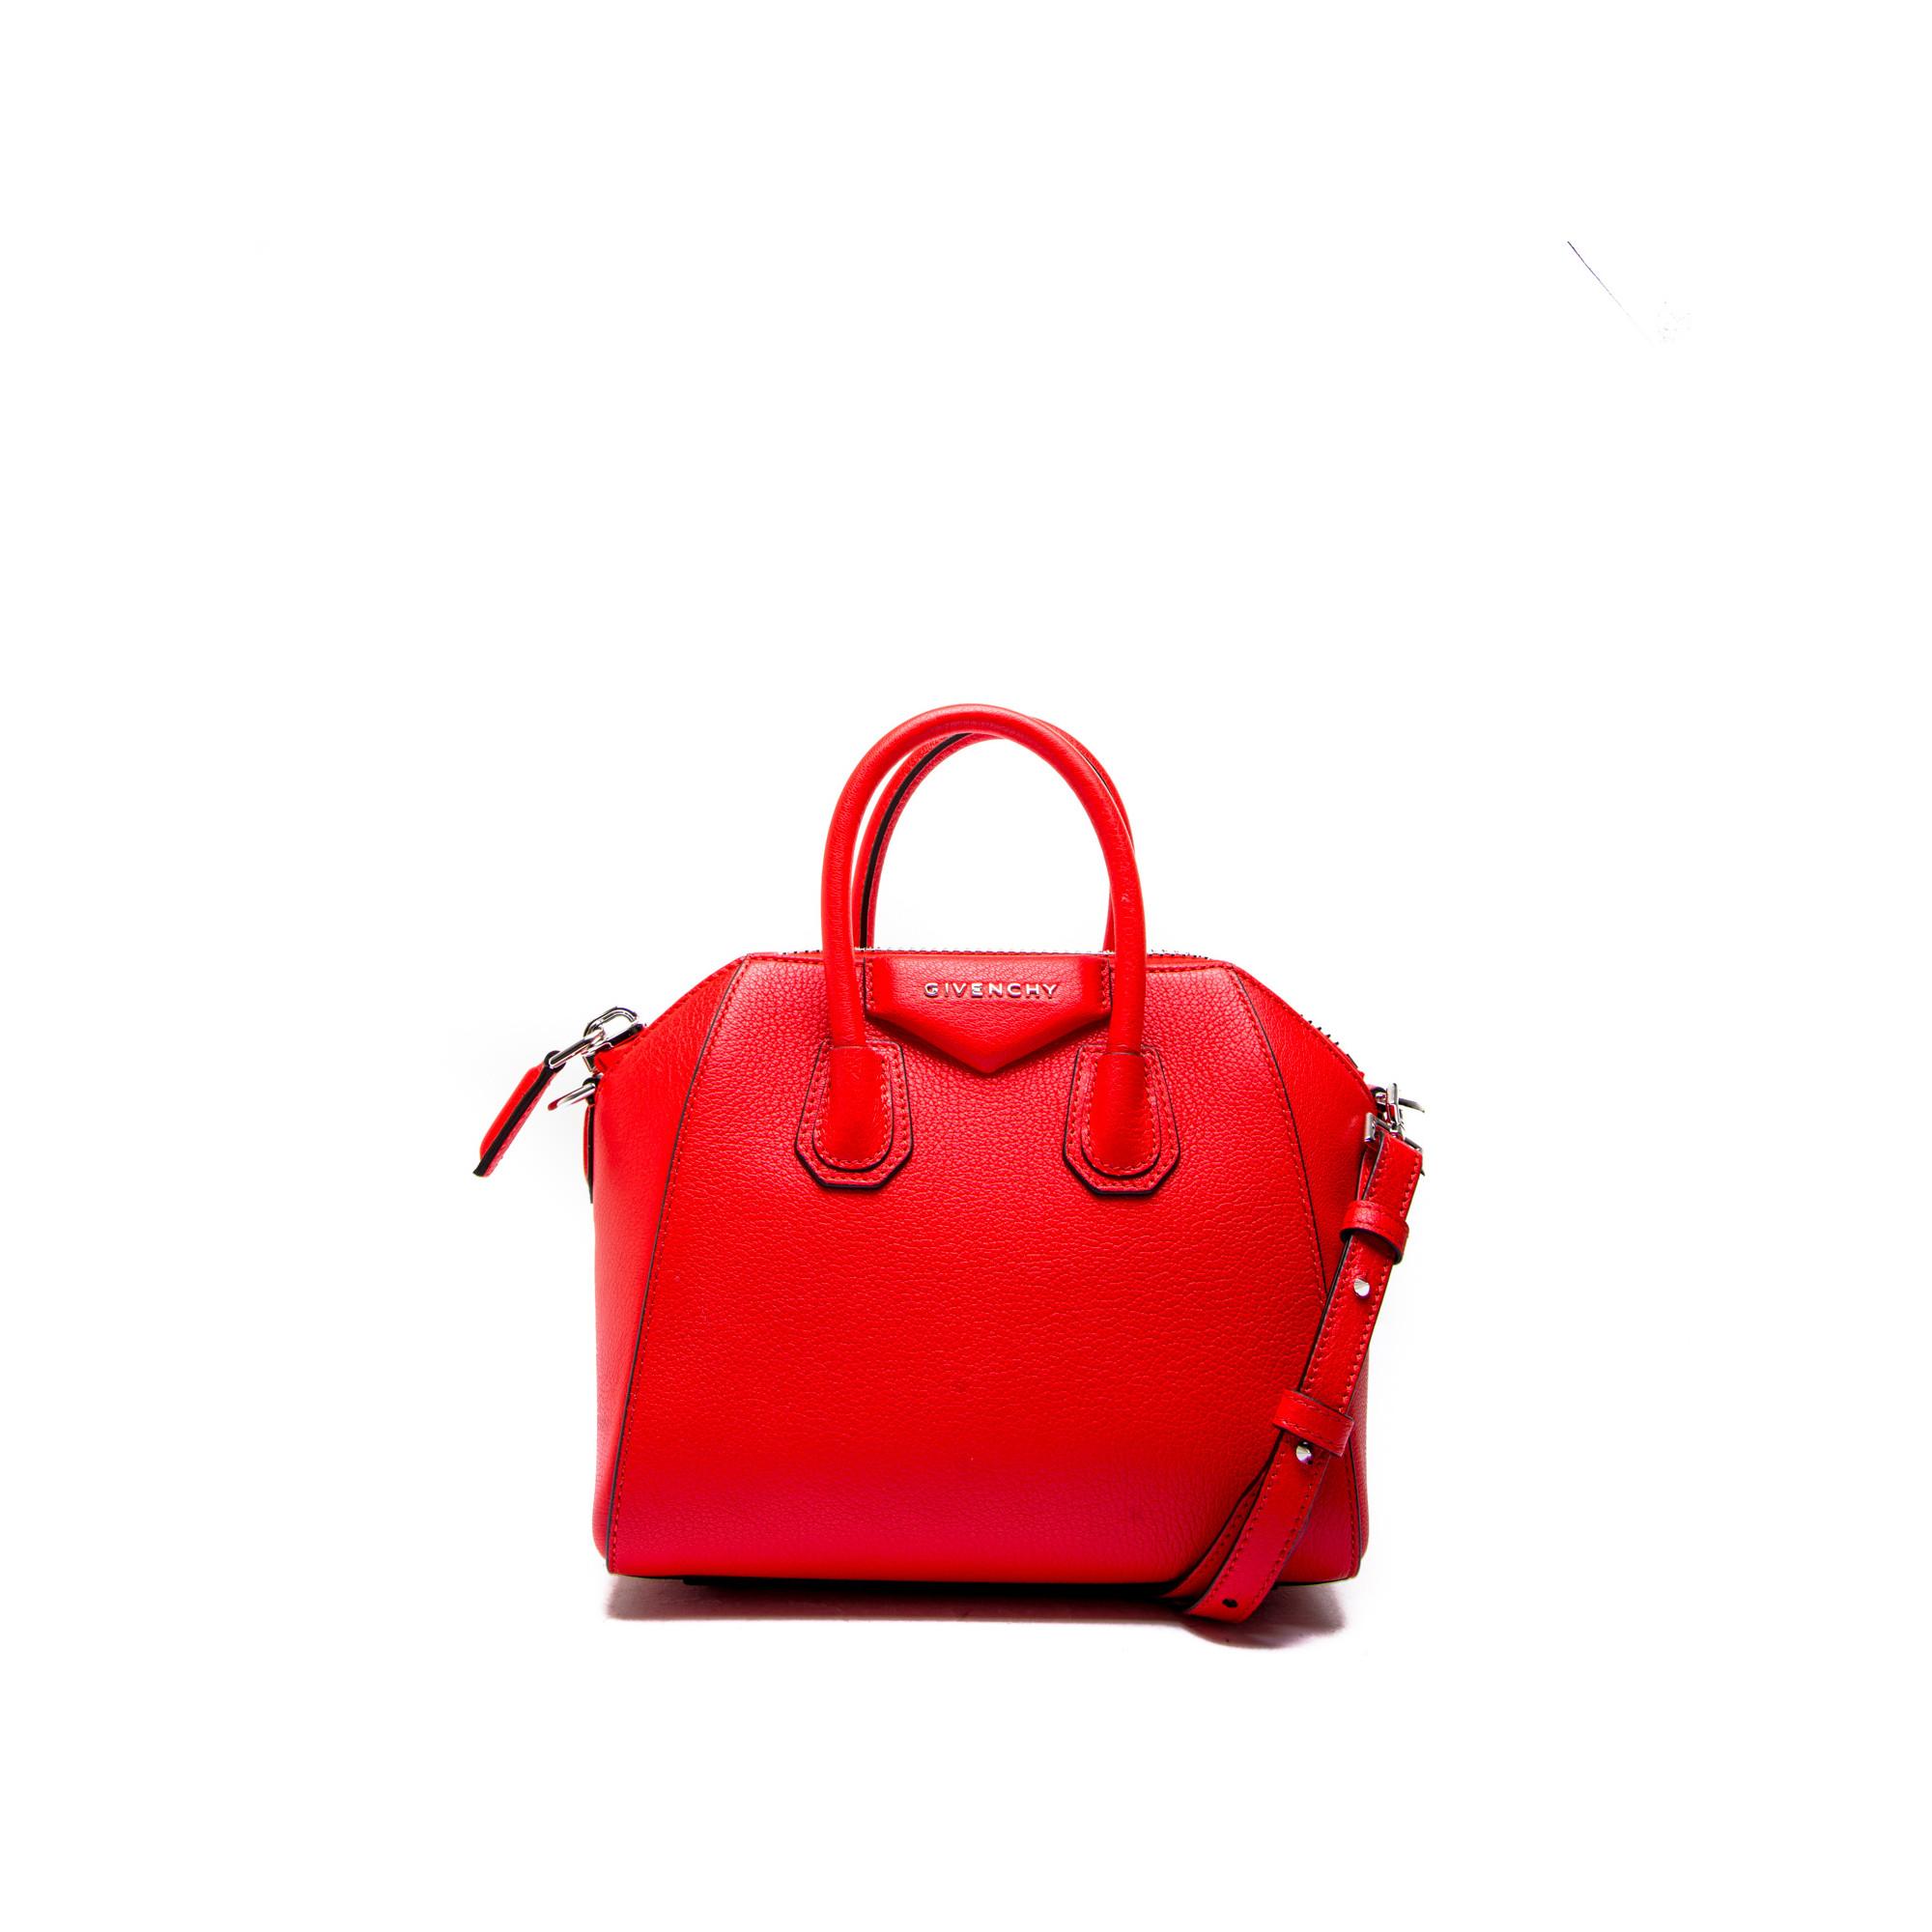 54337431f5 Givenchy antigona bag redbb05114012 629 ss19